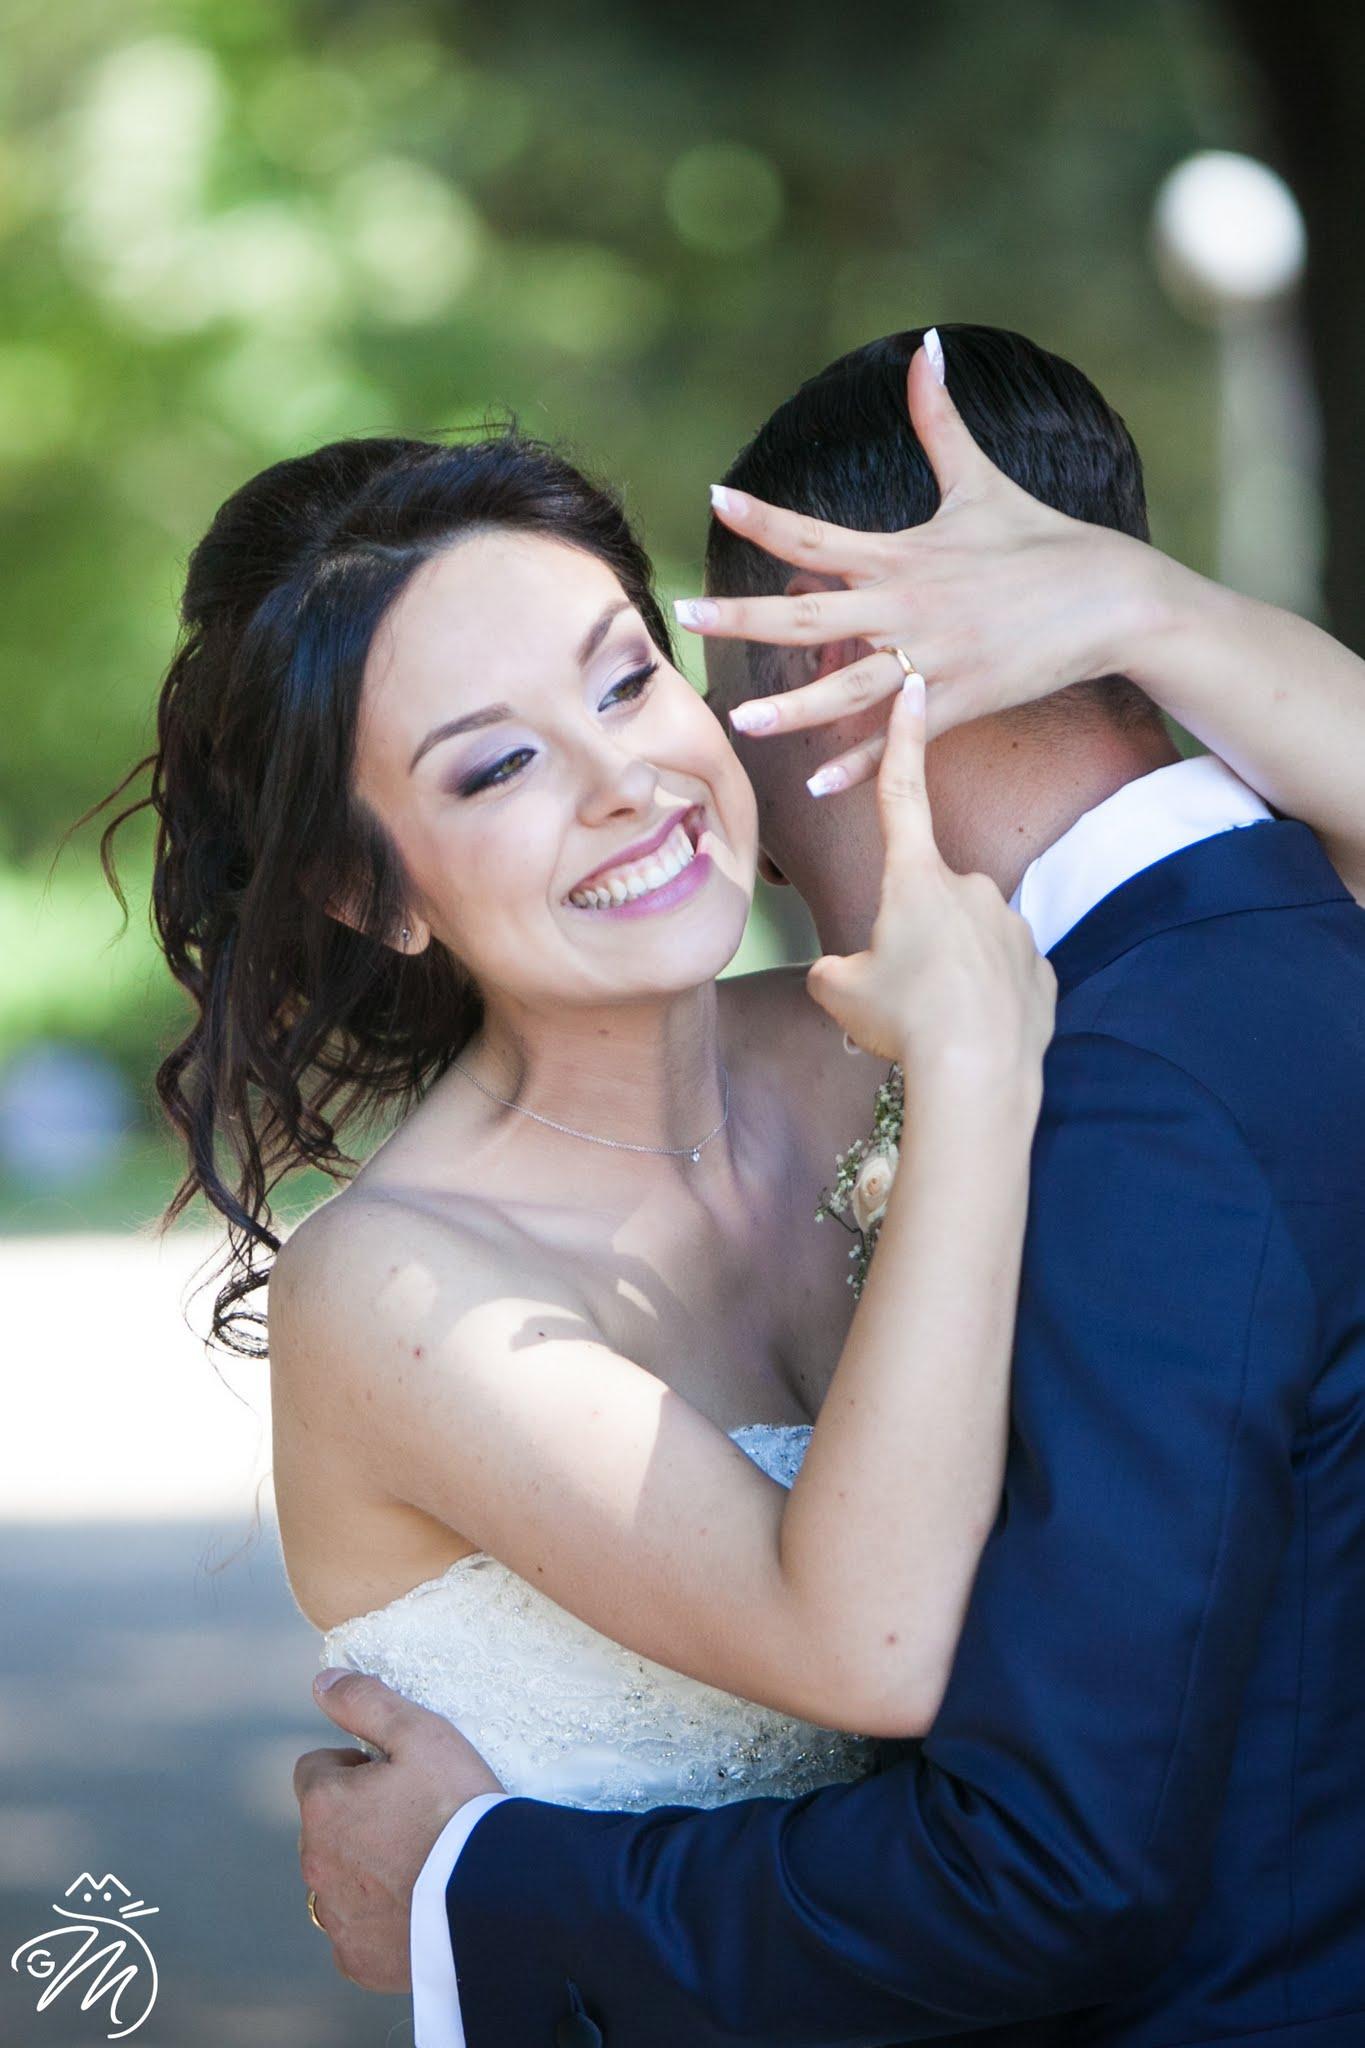 VERTICALI2_LOGO_HOME_PAGE_INTERNATIONAL_PHOTOGRAPHER_IN_ROME_WEDDING_DESTINATION_GIROLAMO_MONTELEONE_-54